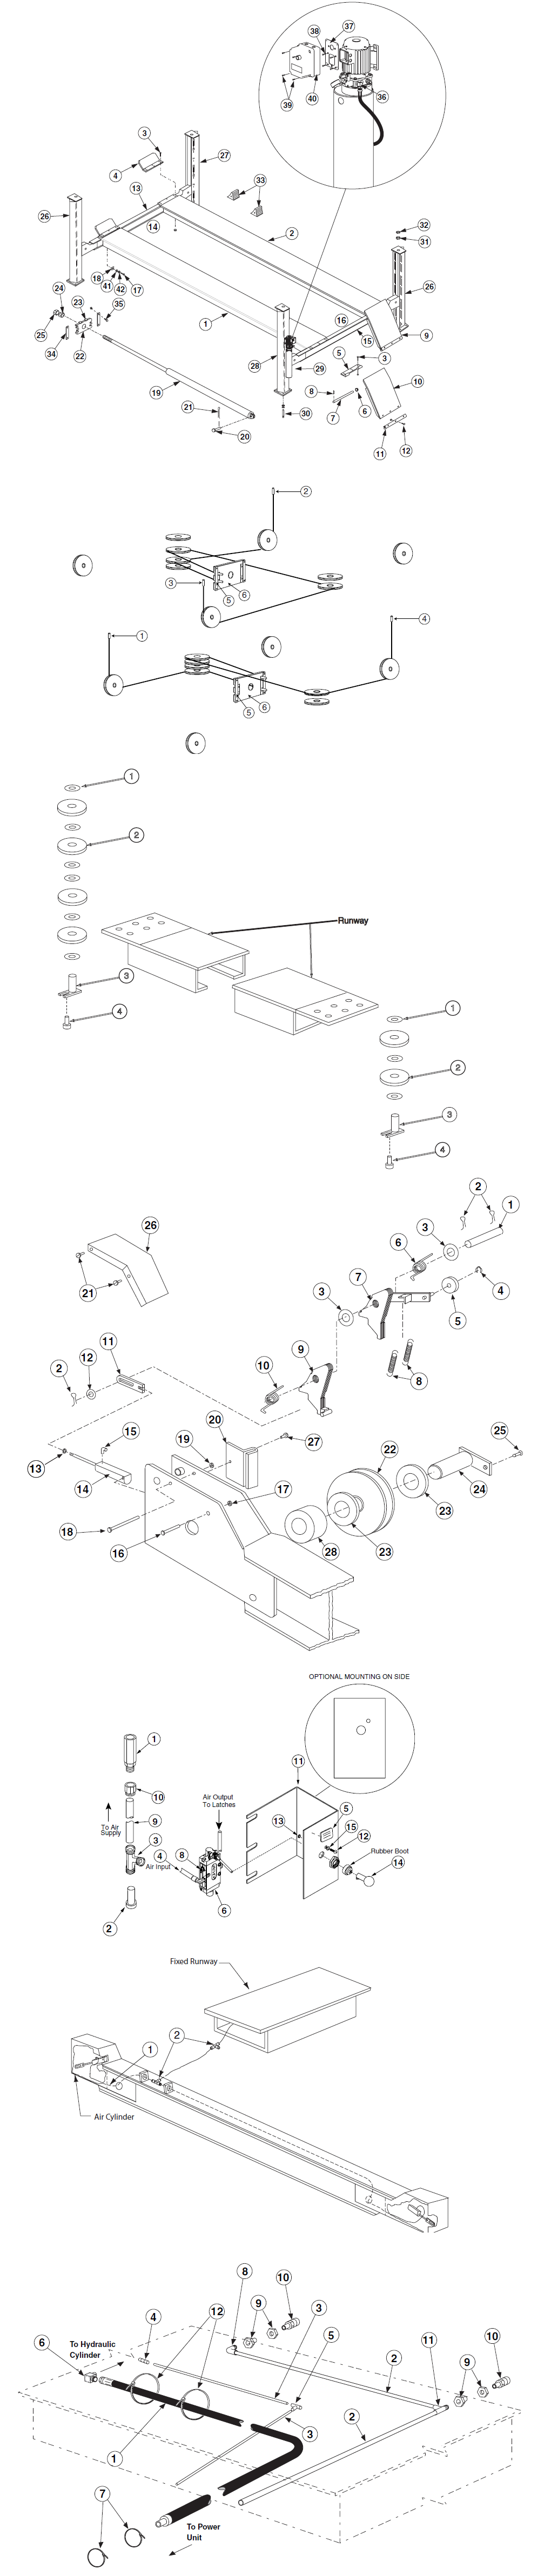 Rotary Rfl25 Parts Diagram